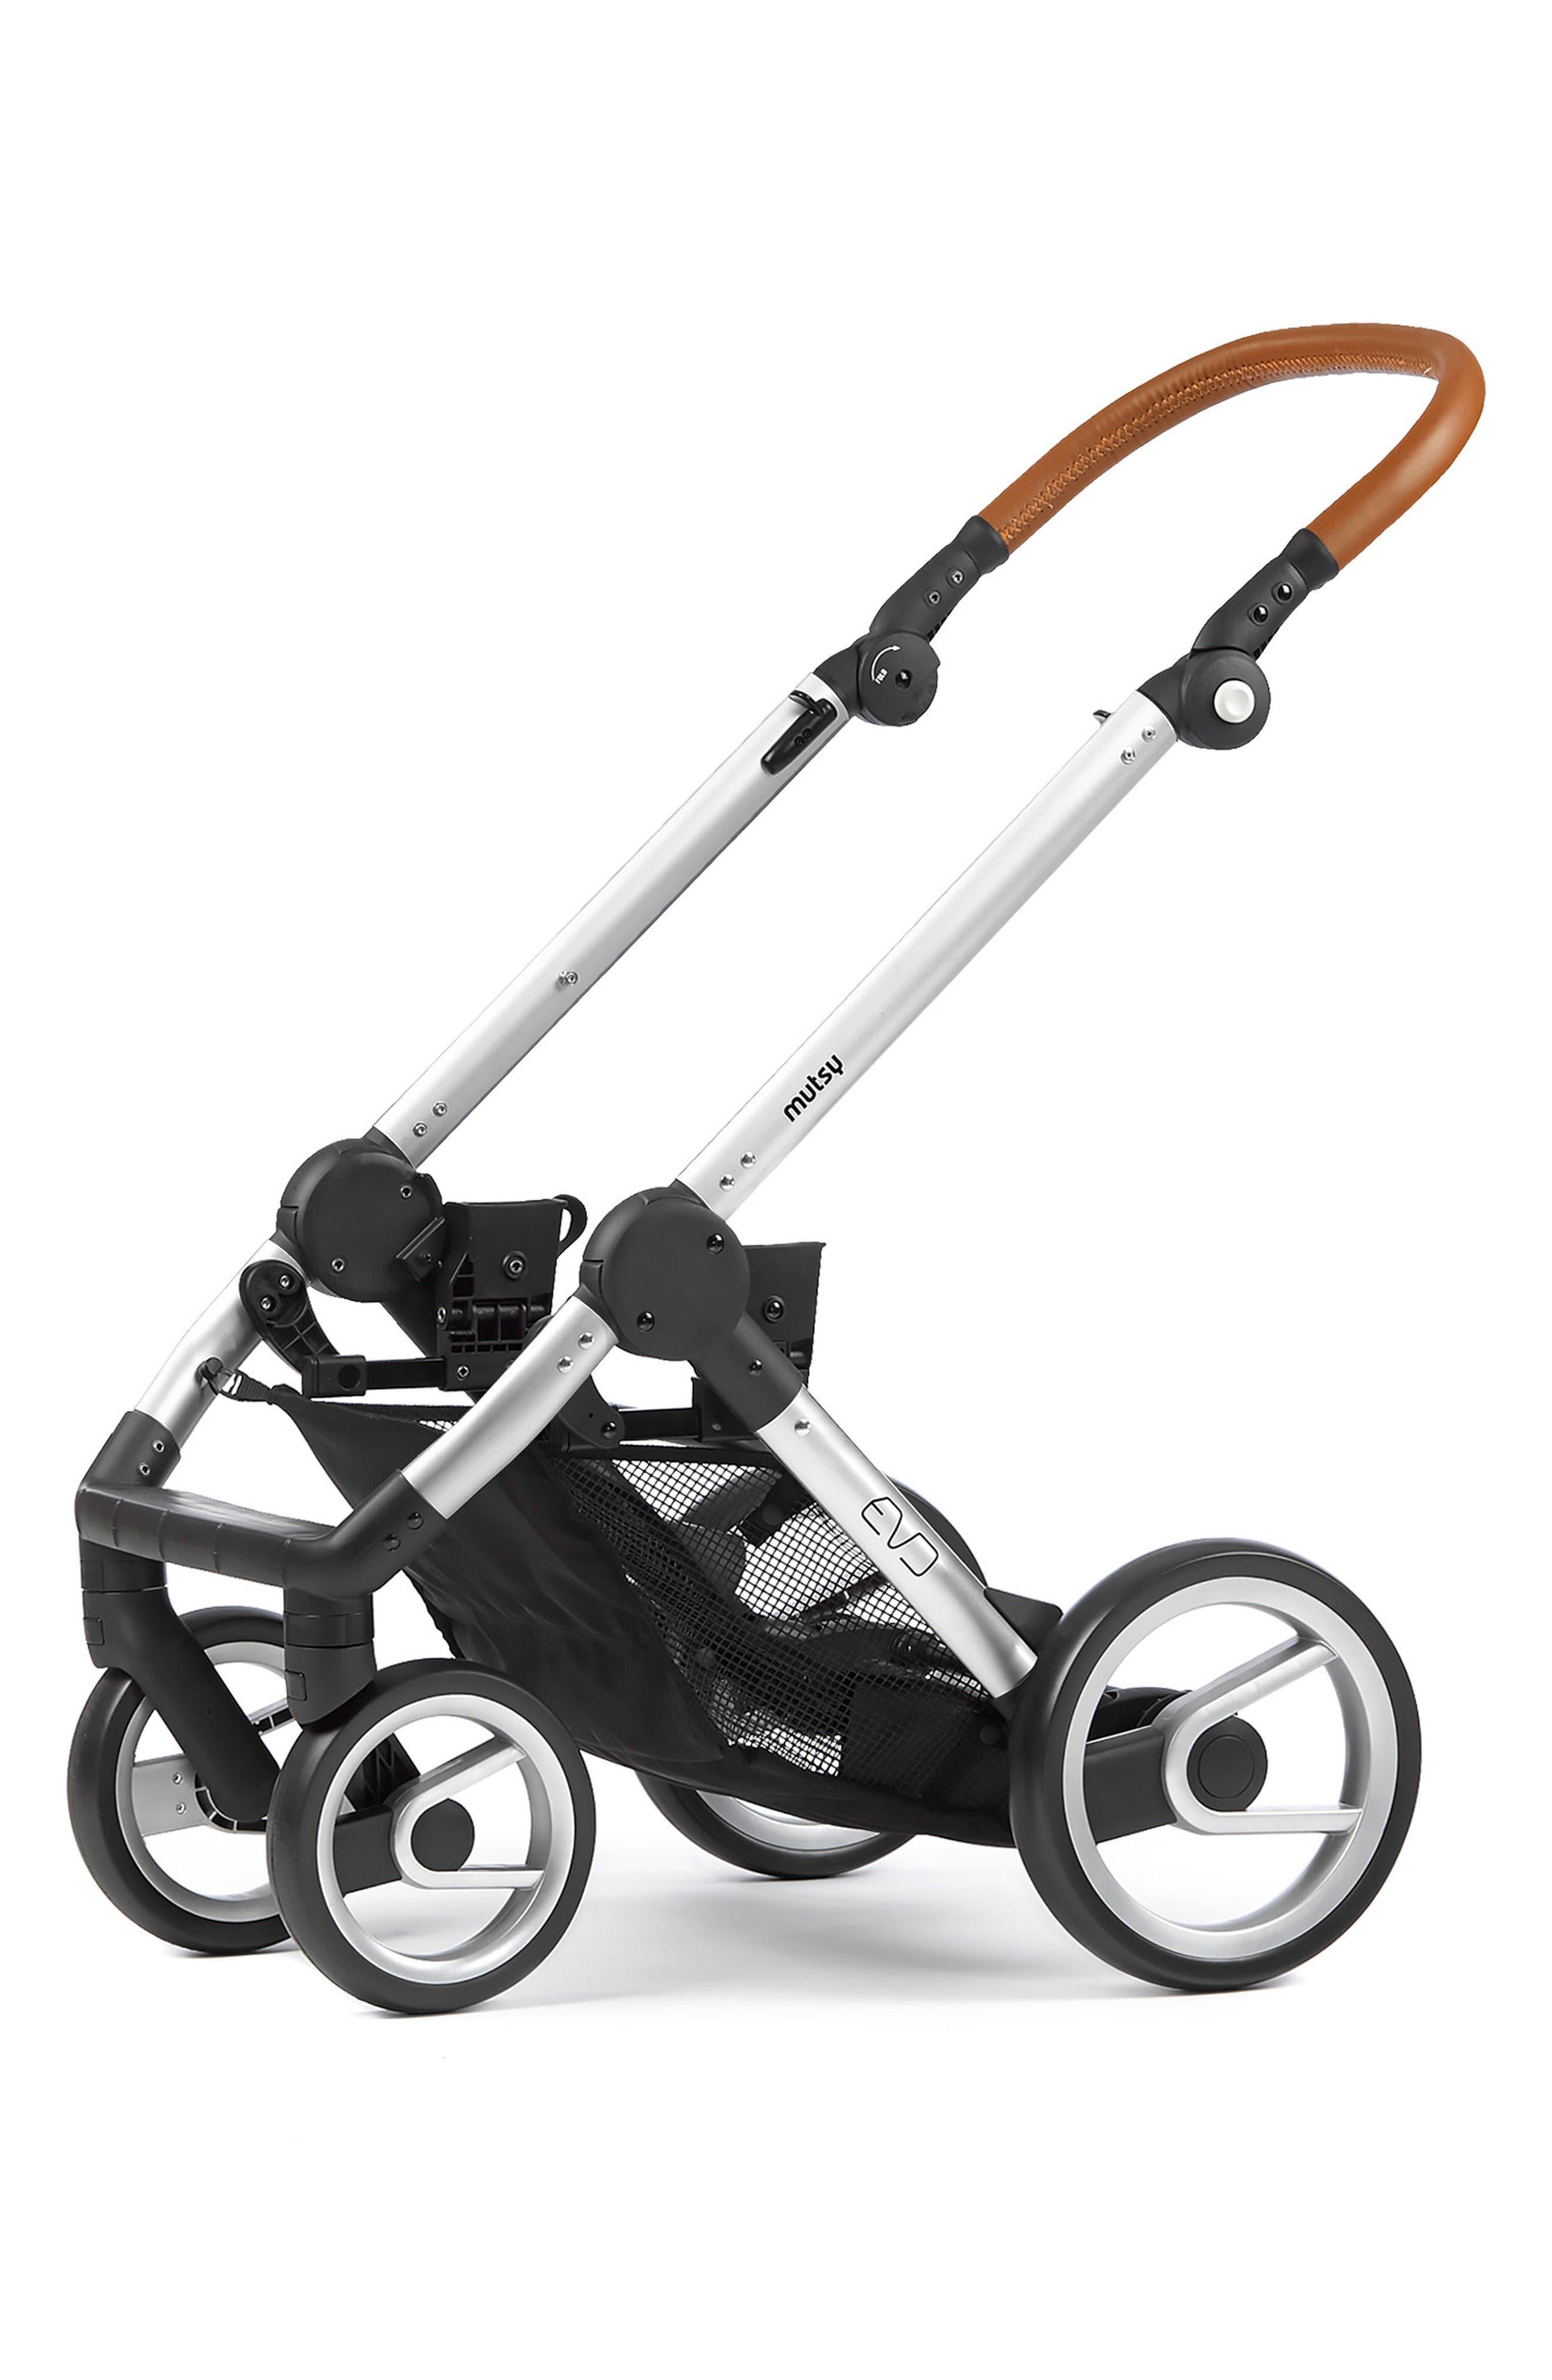 Evo - Urban Nomad Stroller,                             Alternate thumbnail 3, color,                             Silver/ Blue